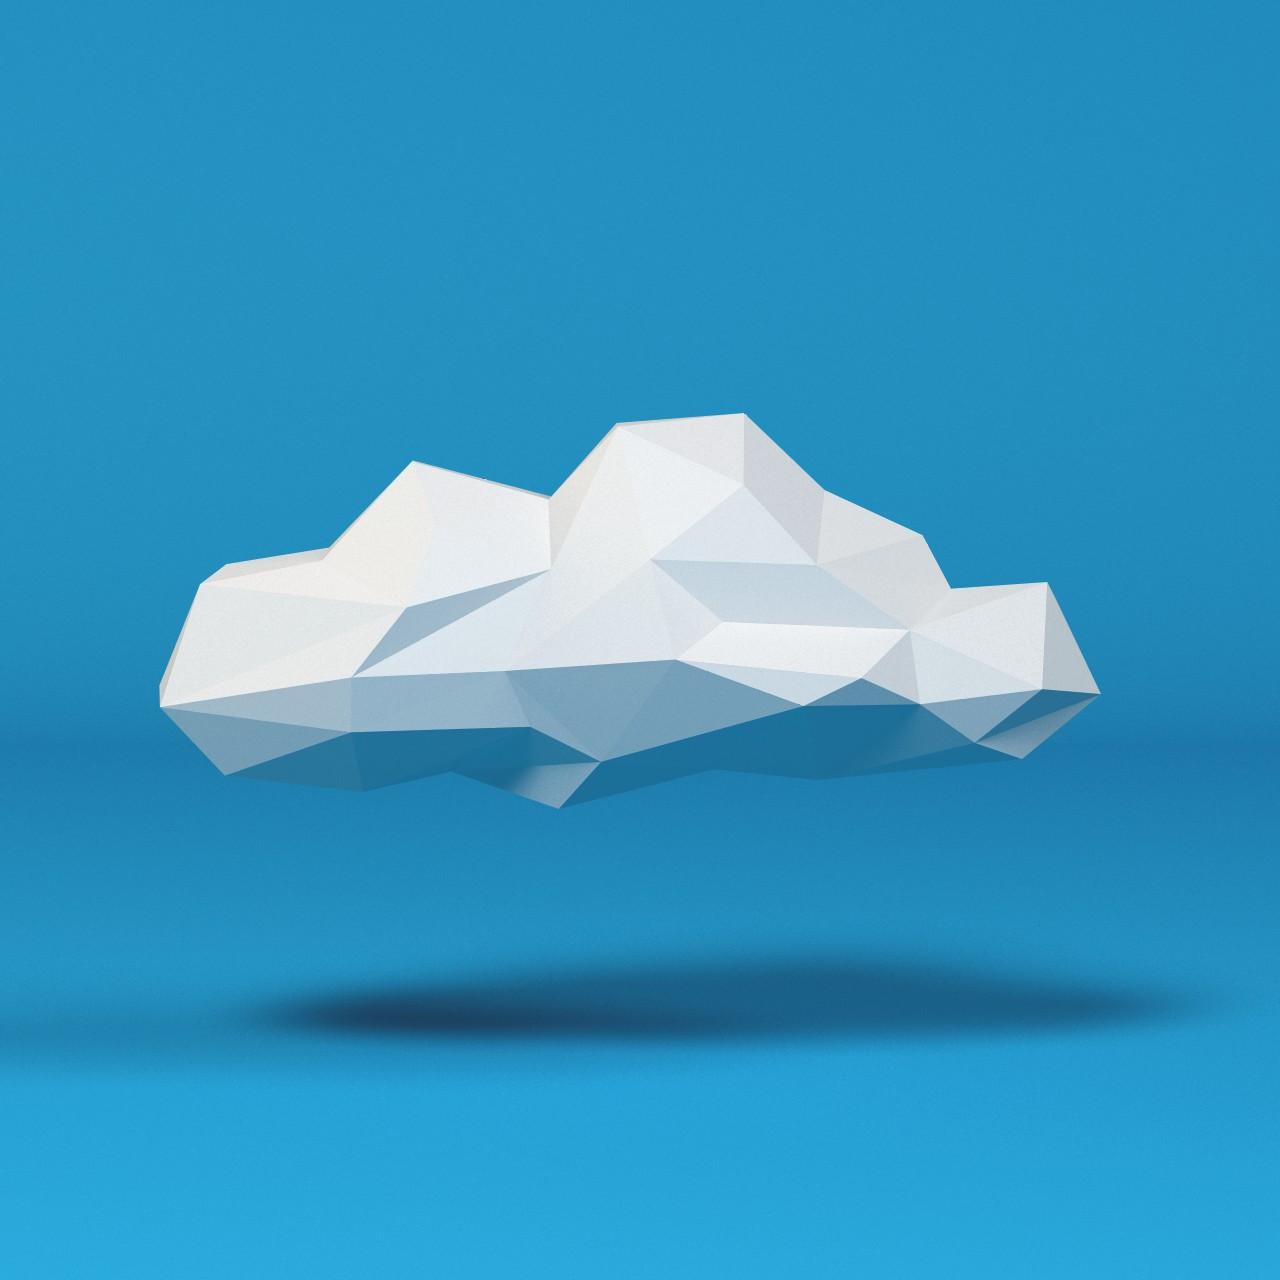 poly_cloud_2_1.jpg